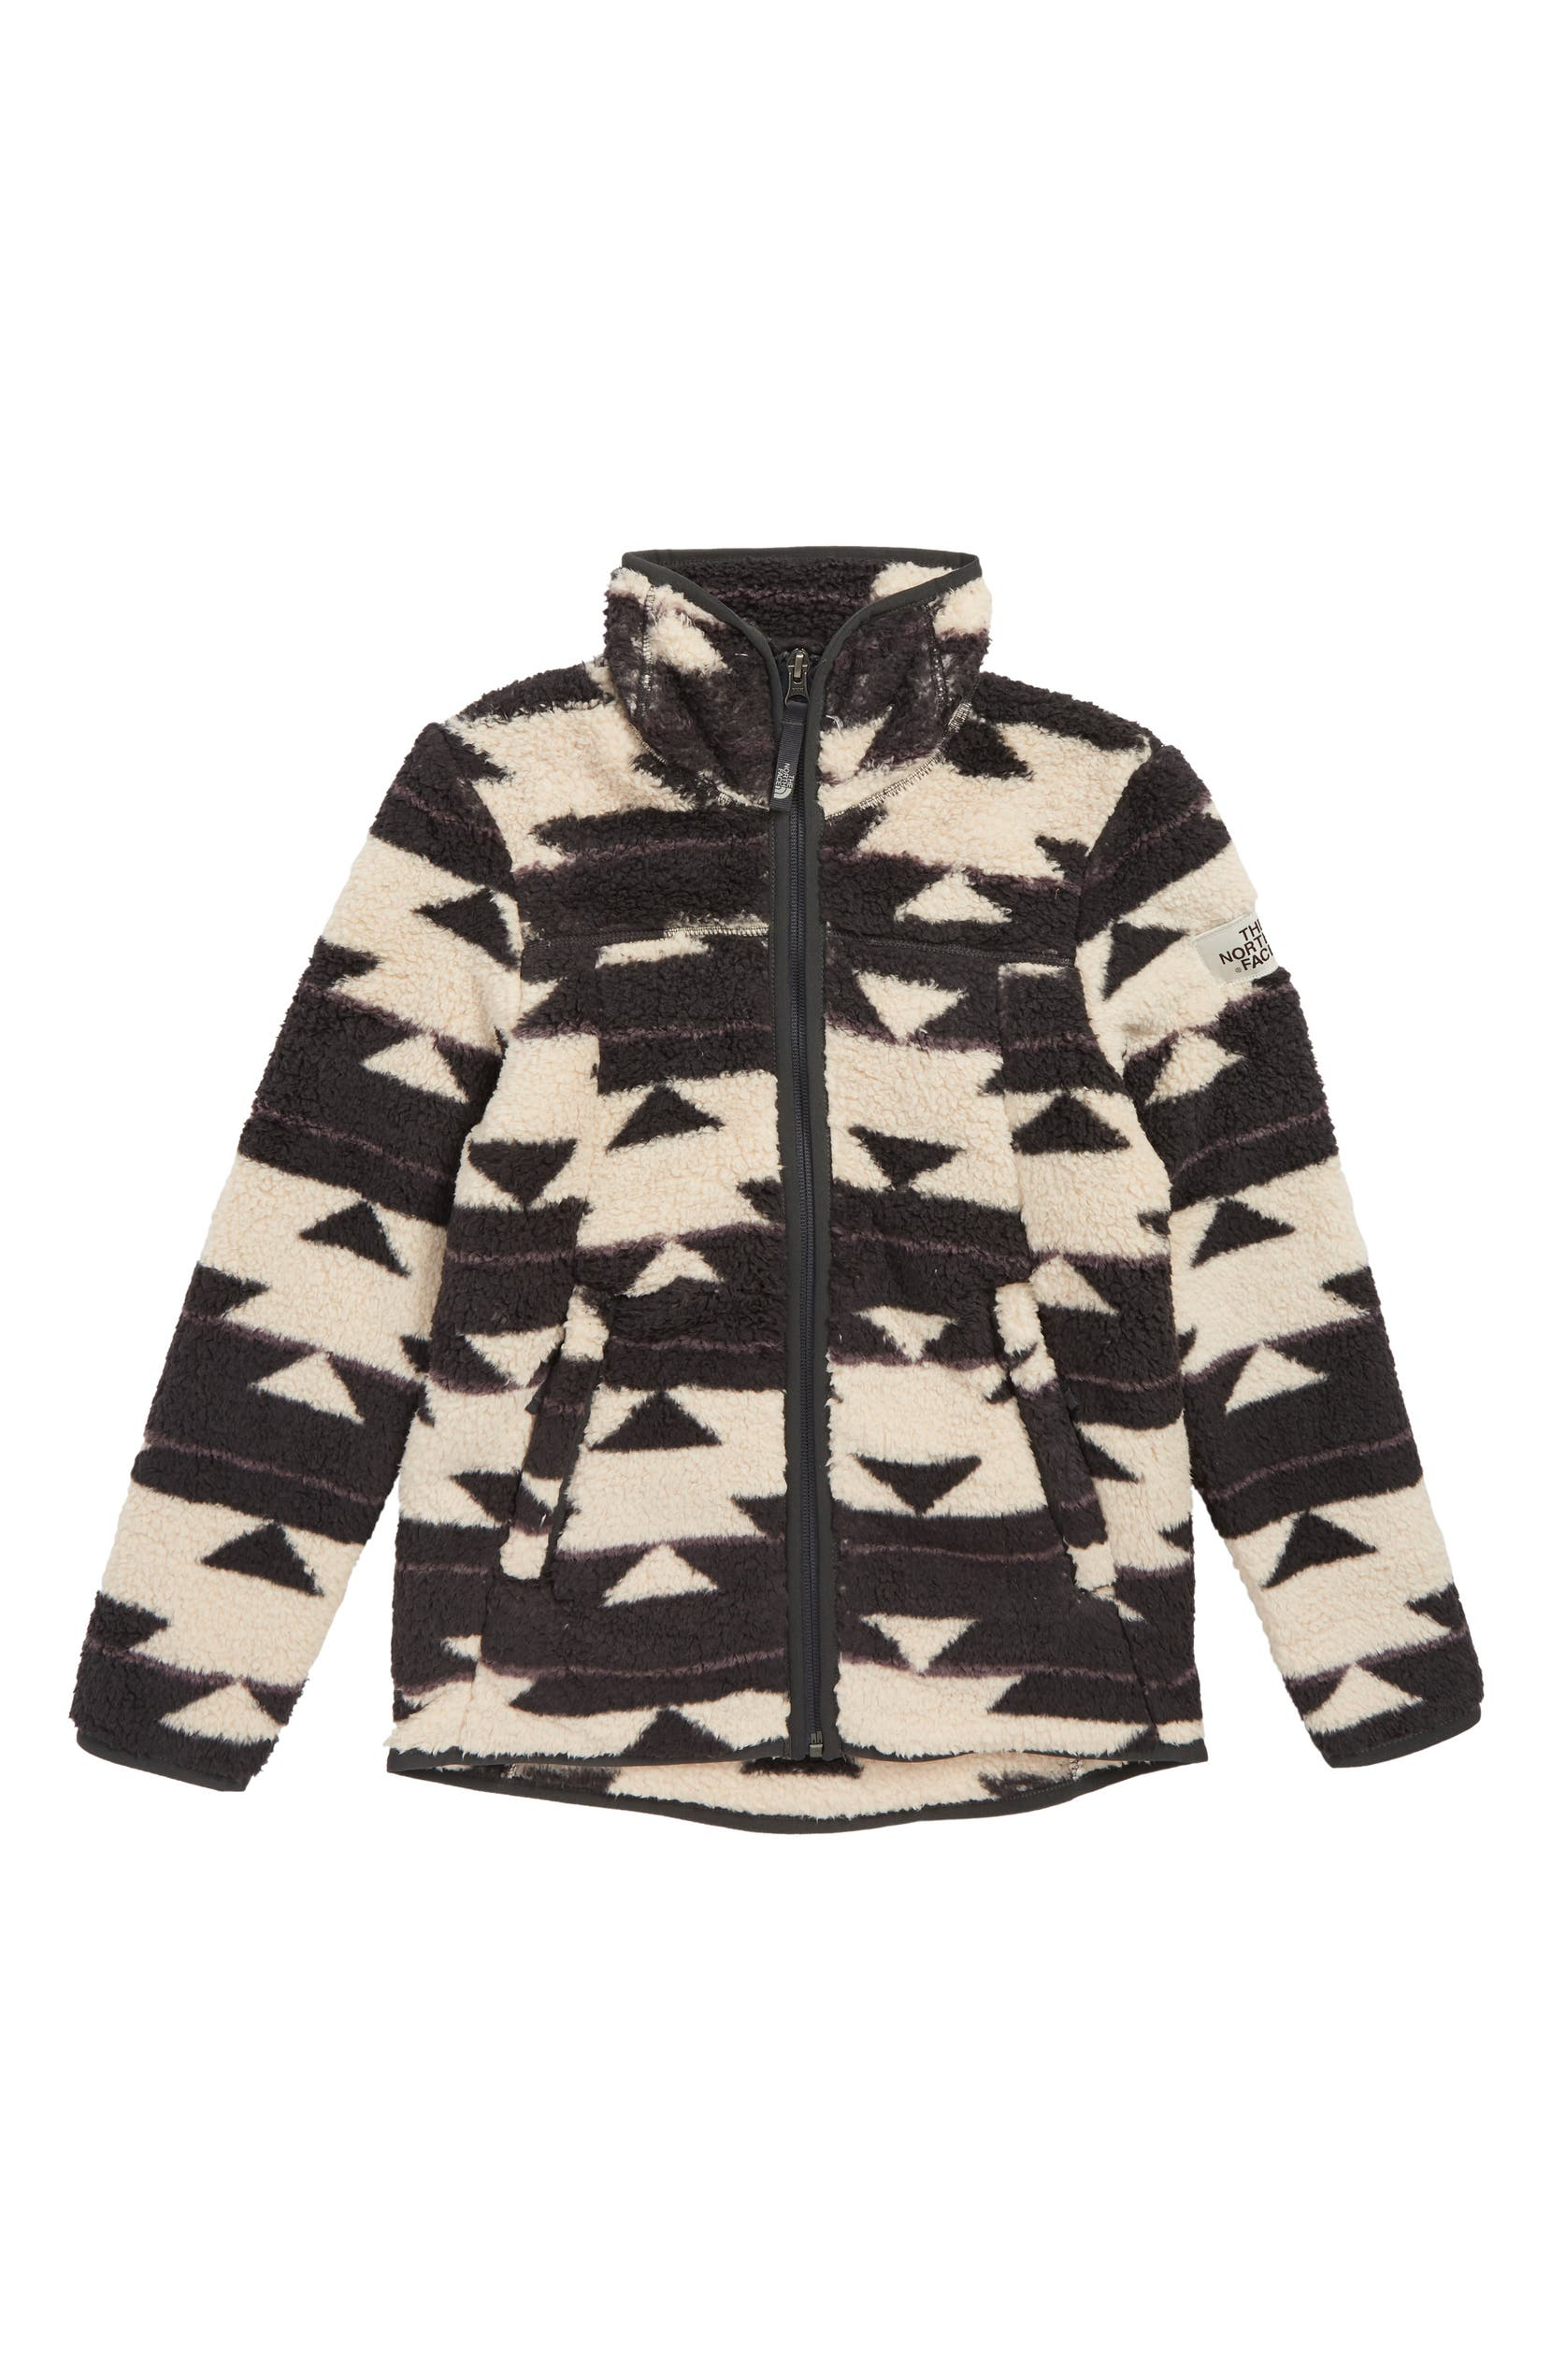 c7f6e8ca8 Campshire Fleece Jacket